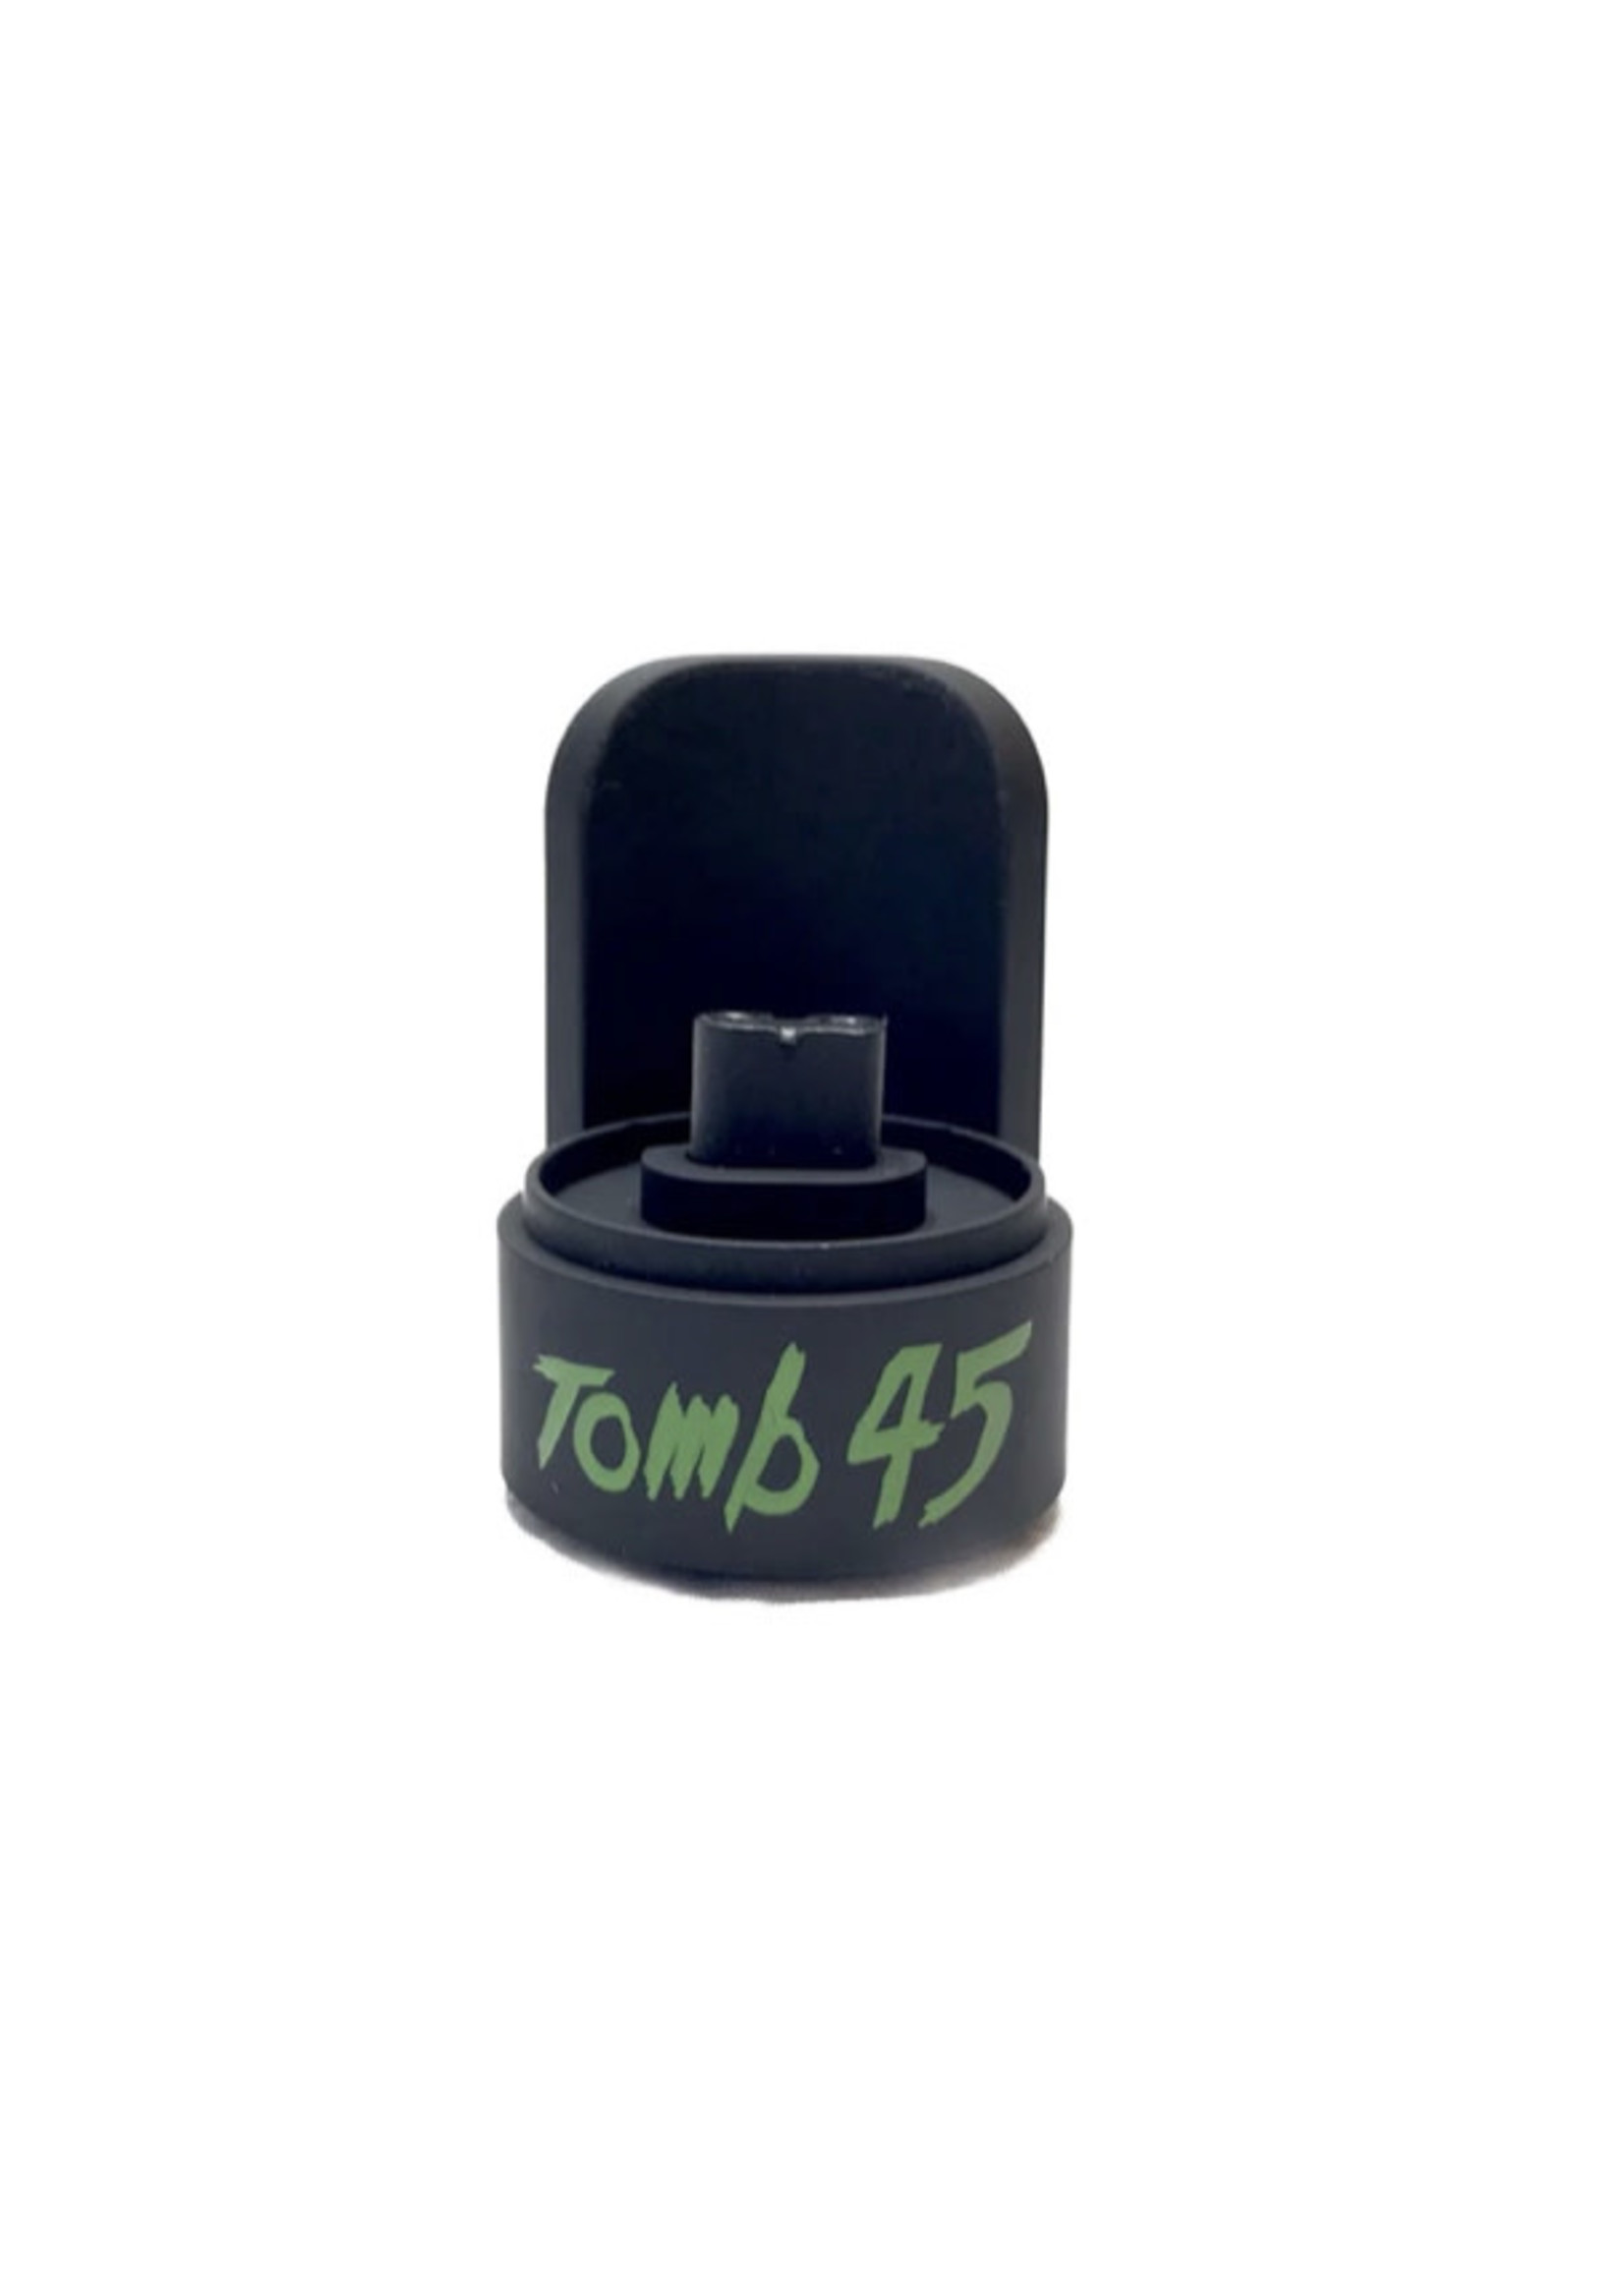 Tomb 45 Tomb45 Power Clip- Wahl Senior